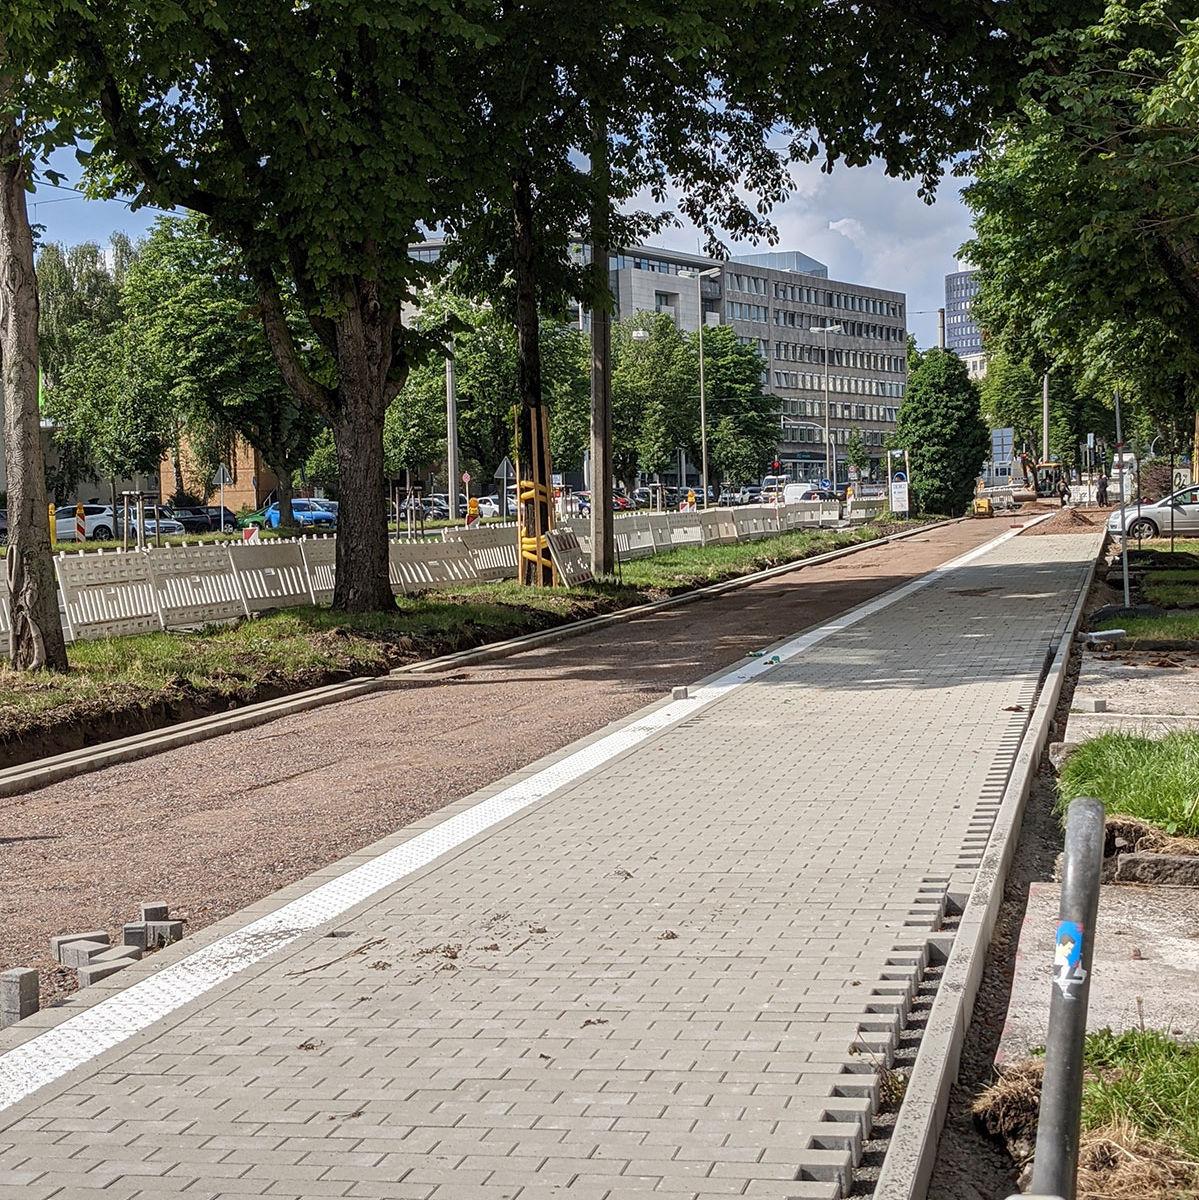 halb fertig gepflasterter Gehweg, der am noch nicht fertigem Radweg des Radwalls ins Dortmund entlang führt